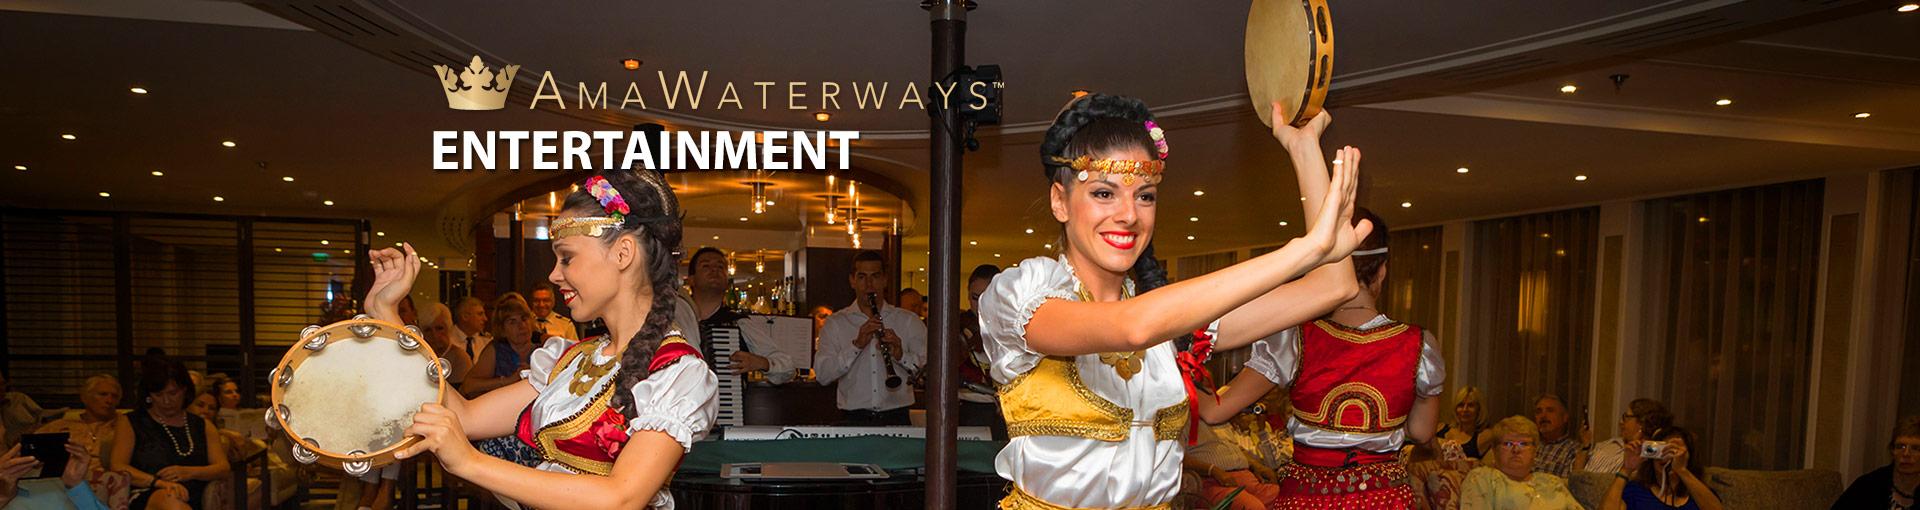 AmaWaterways Entertainment